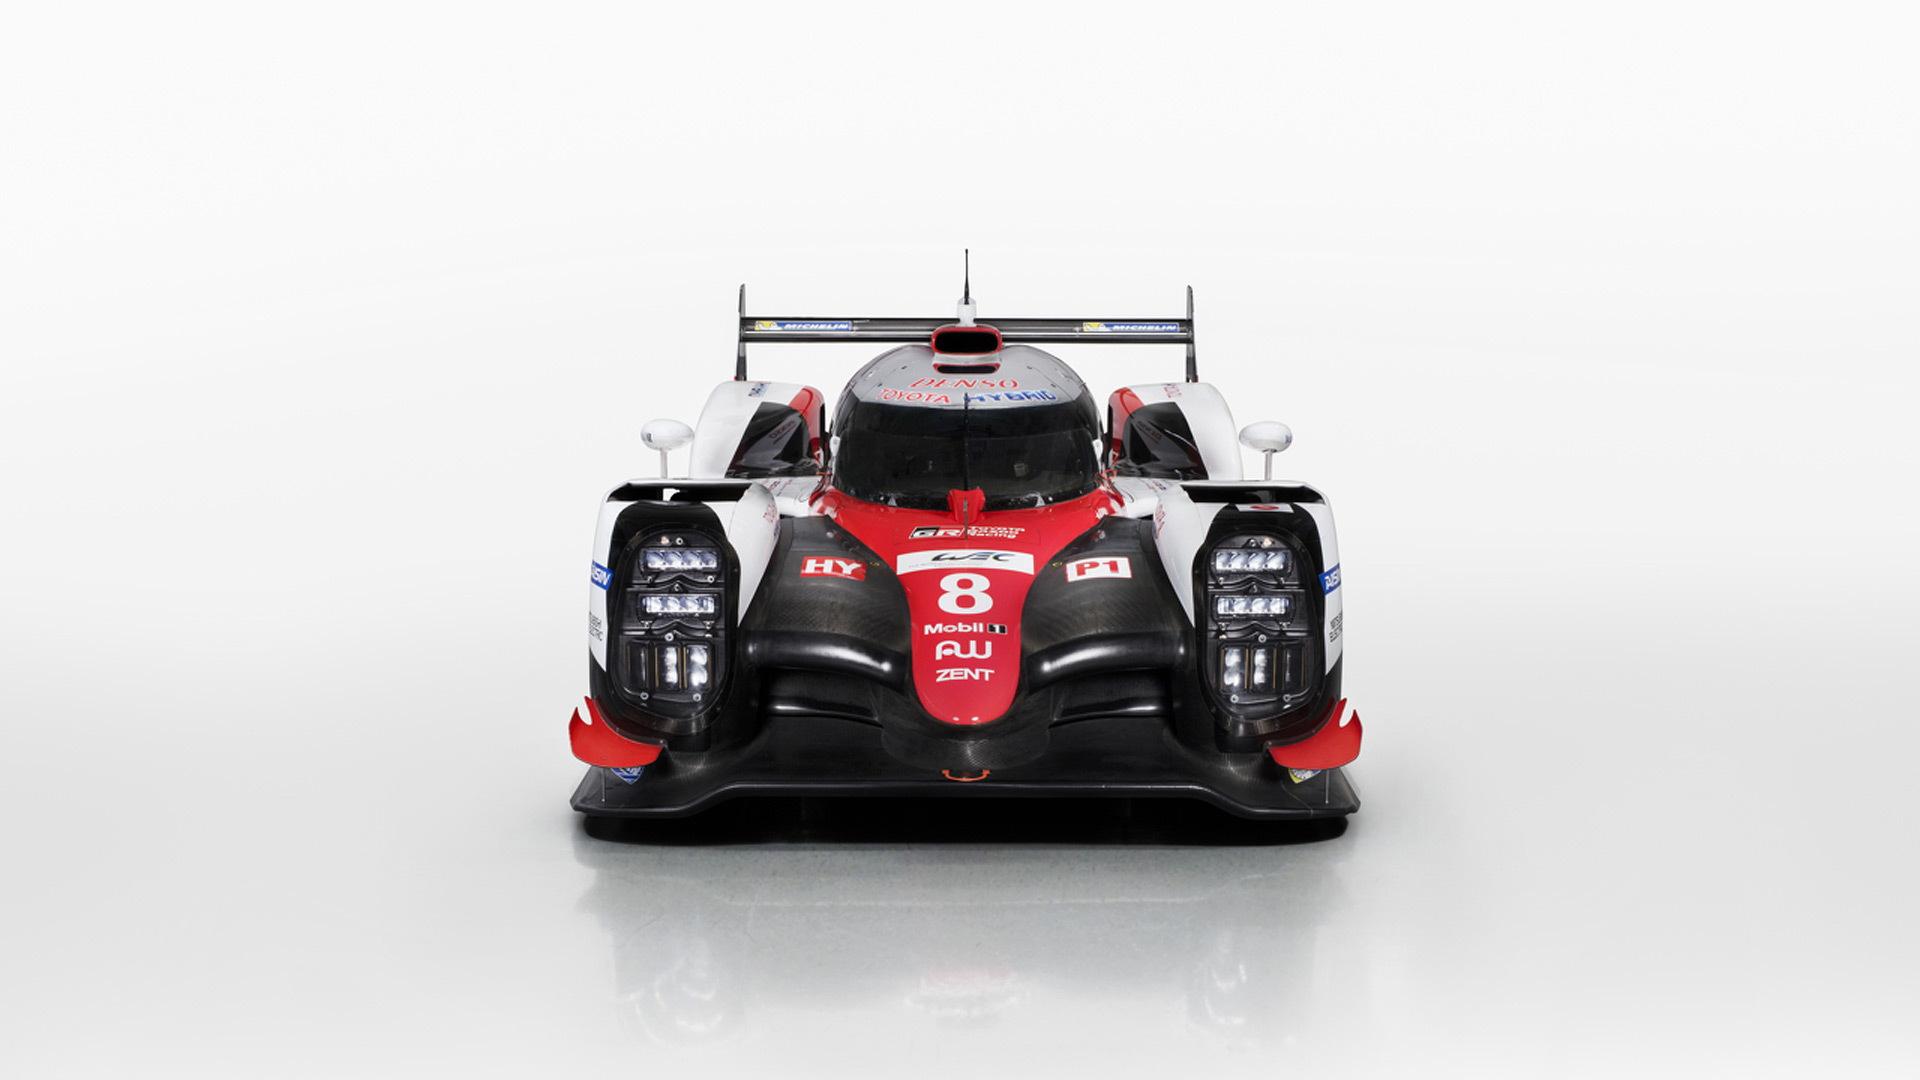 2017 Toyota TS050 Hybrid LMP1 race car